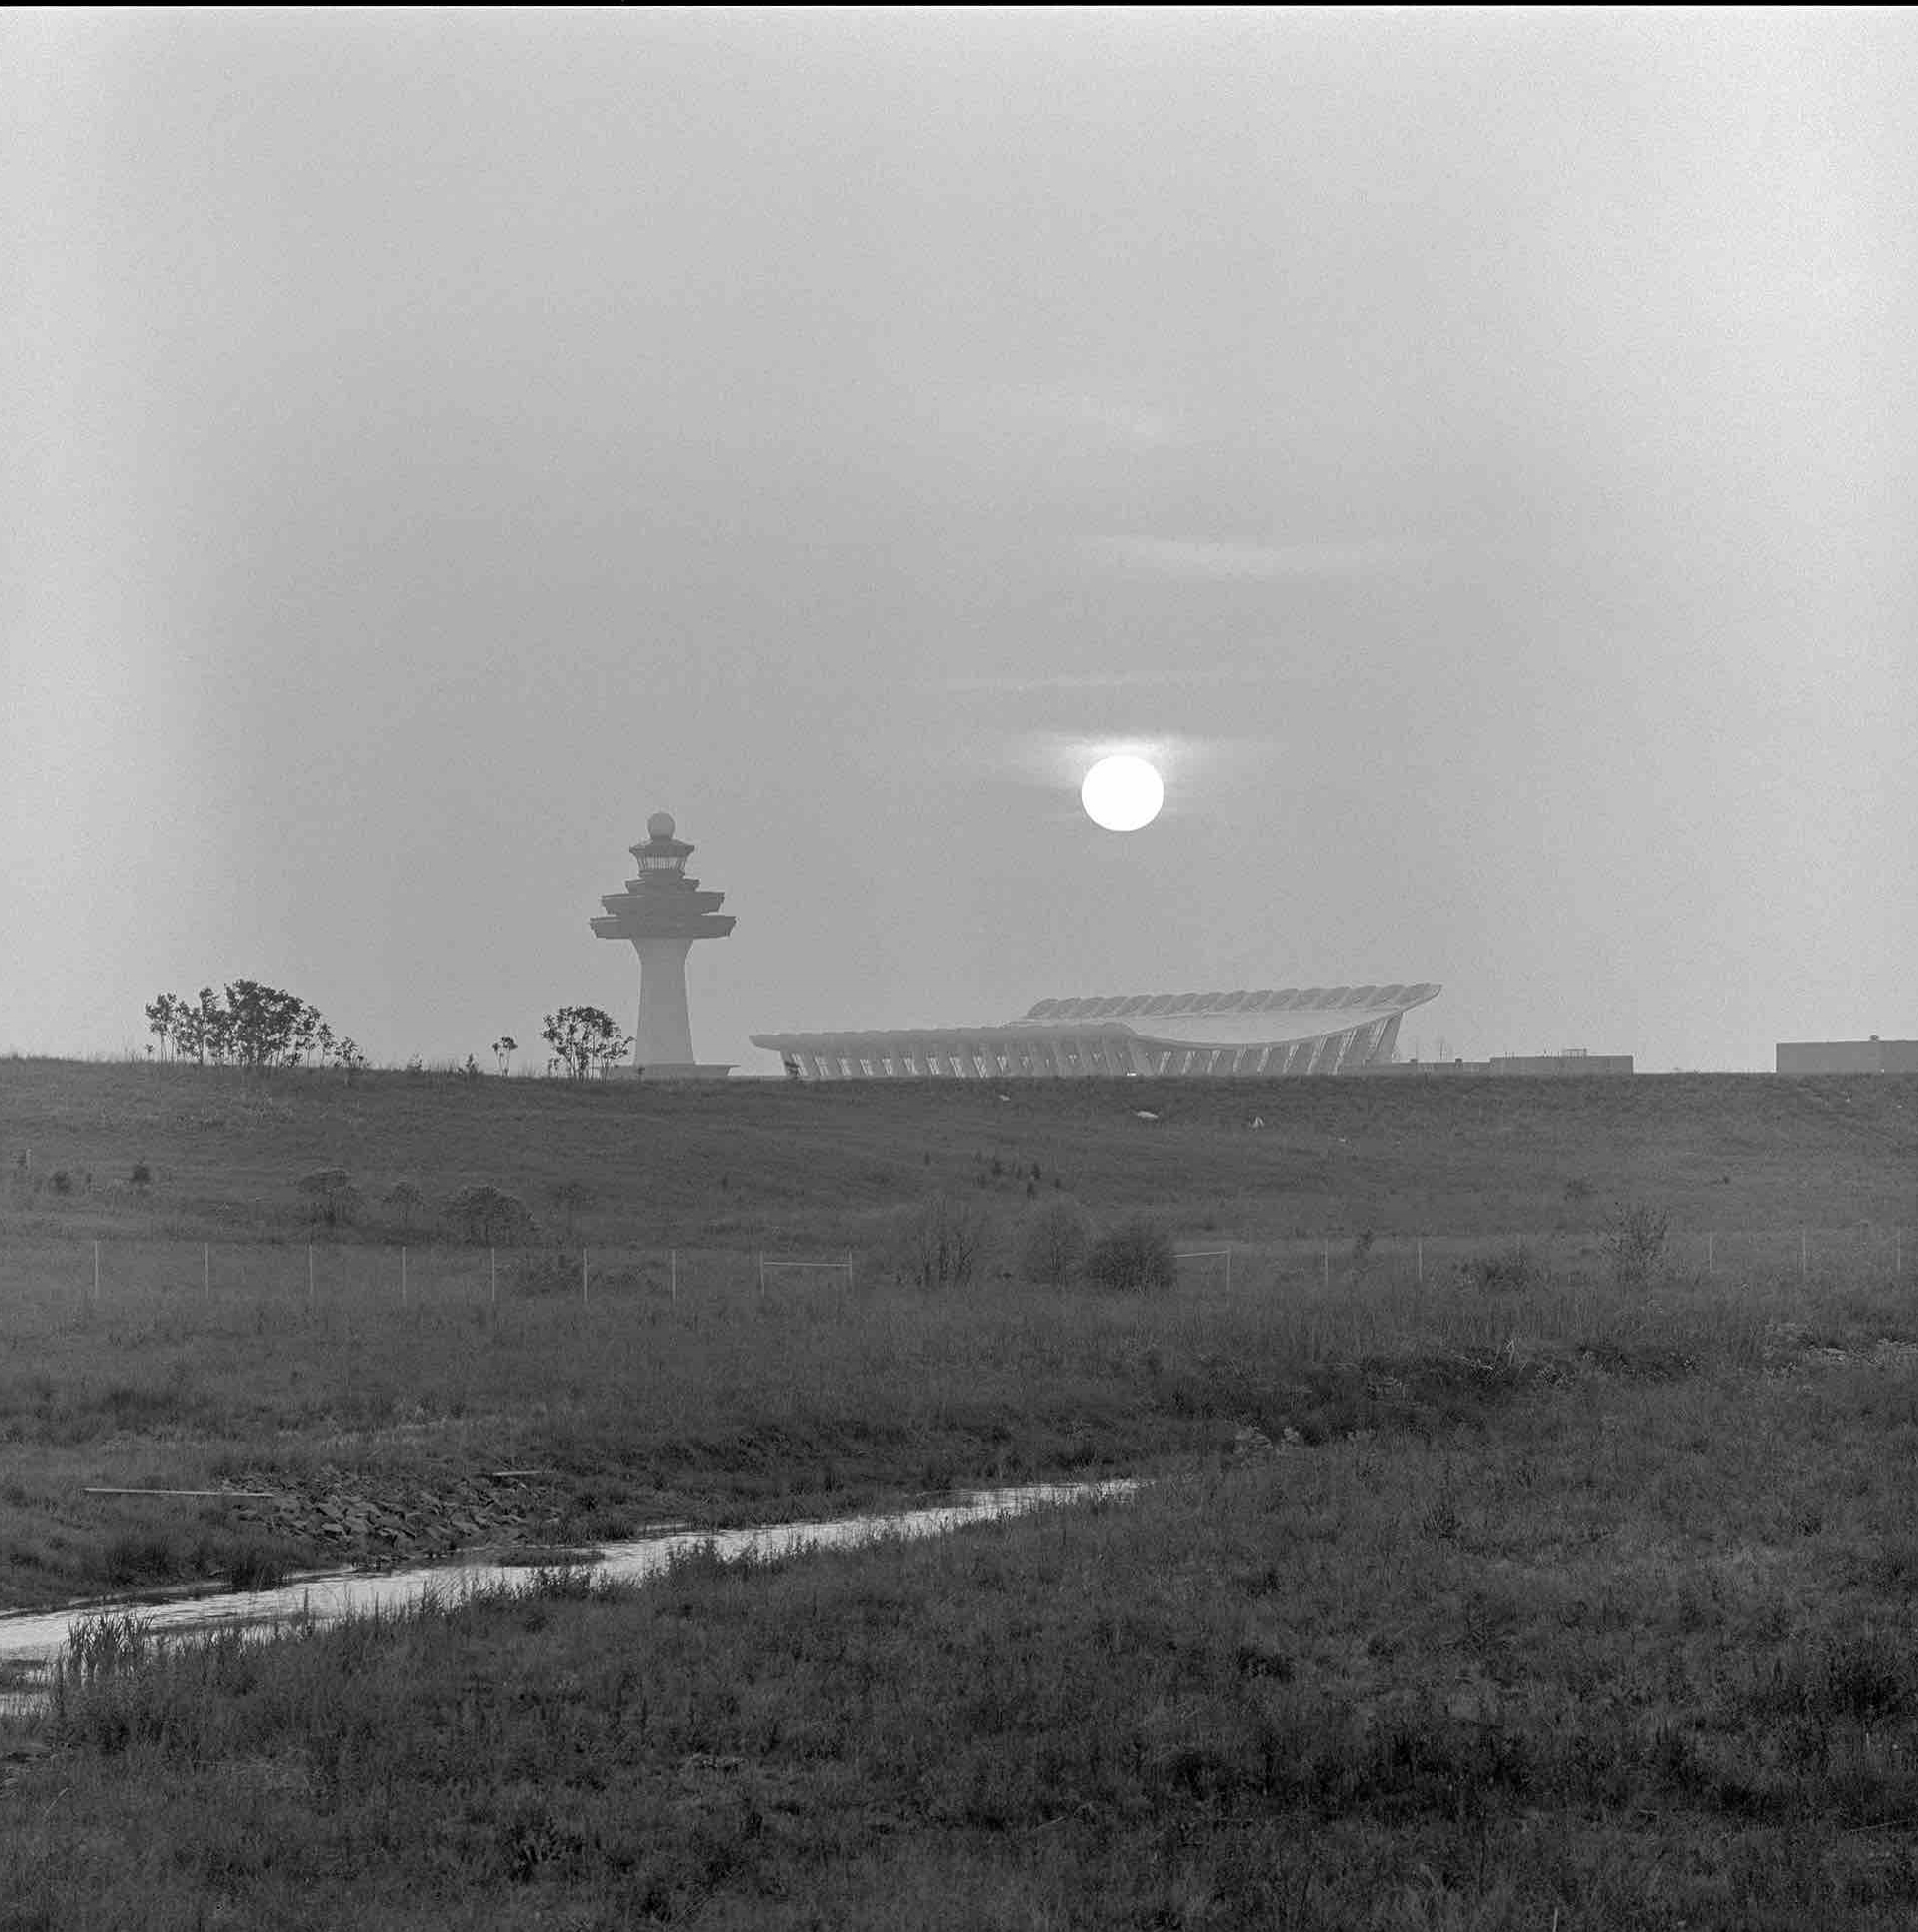 Eero Saarinen, Washington Dulles International Airport (Washington, D.C.) 1962